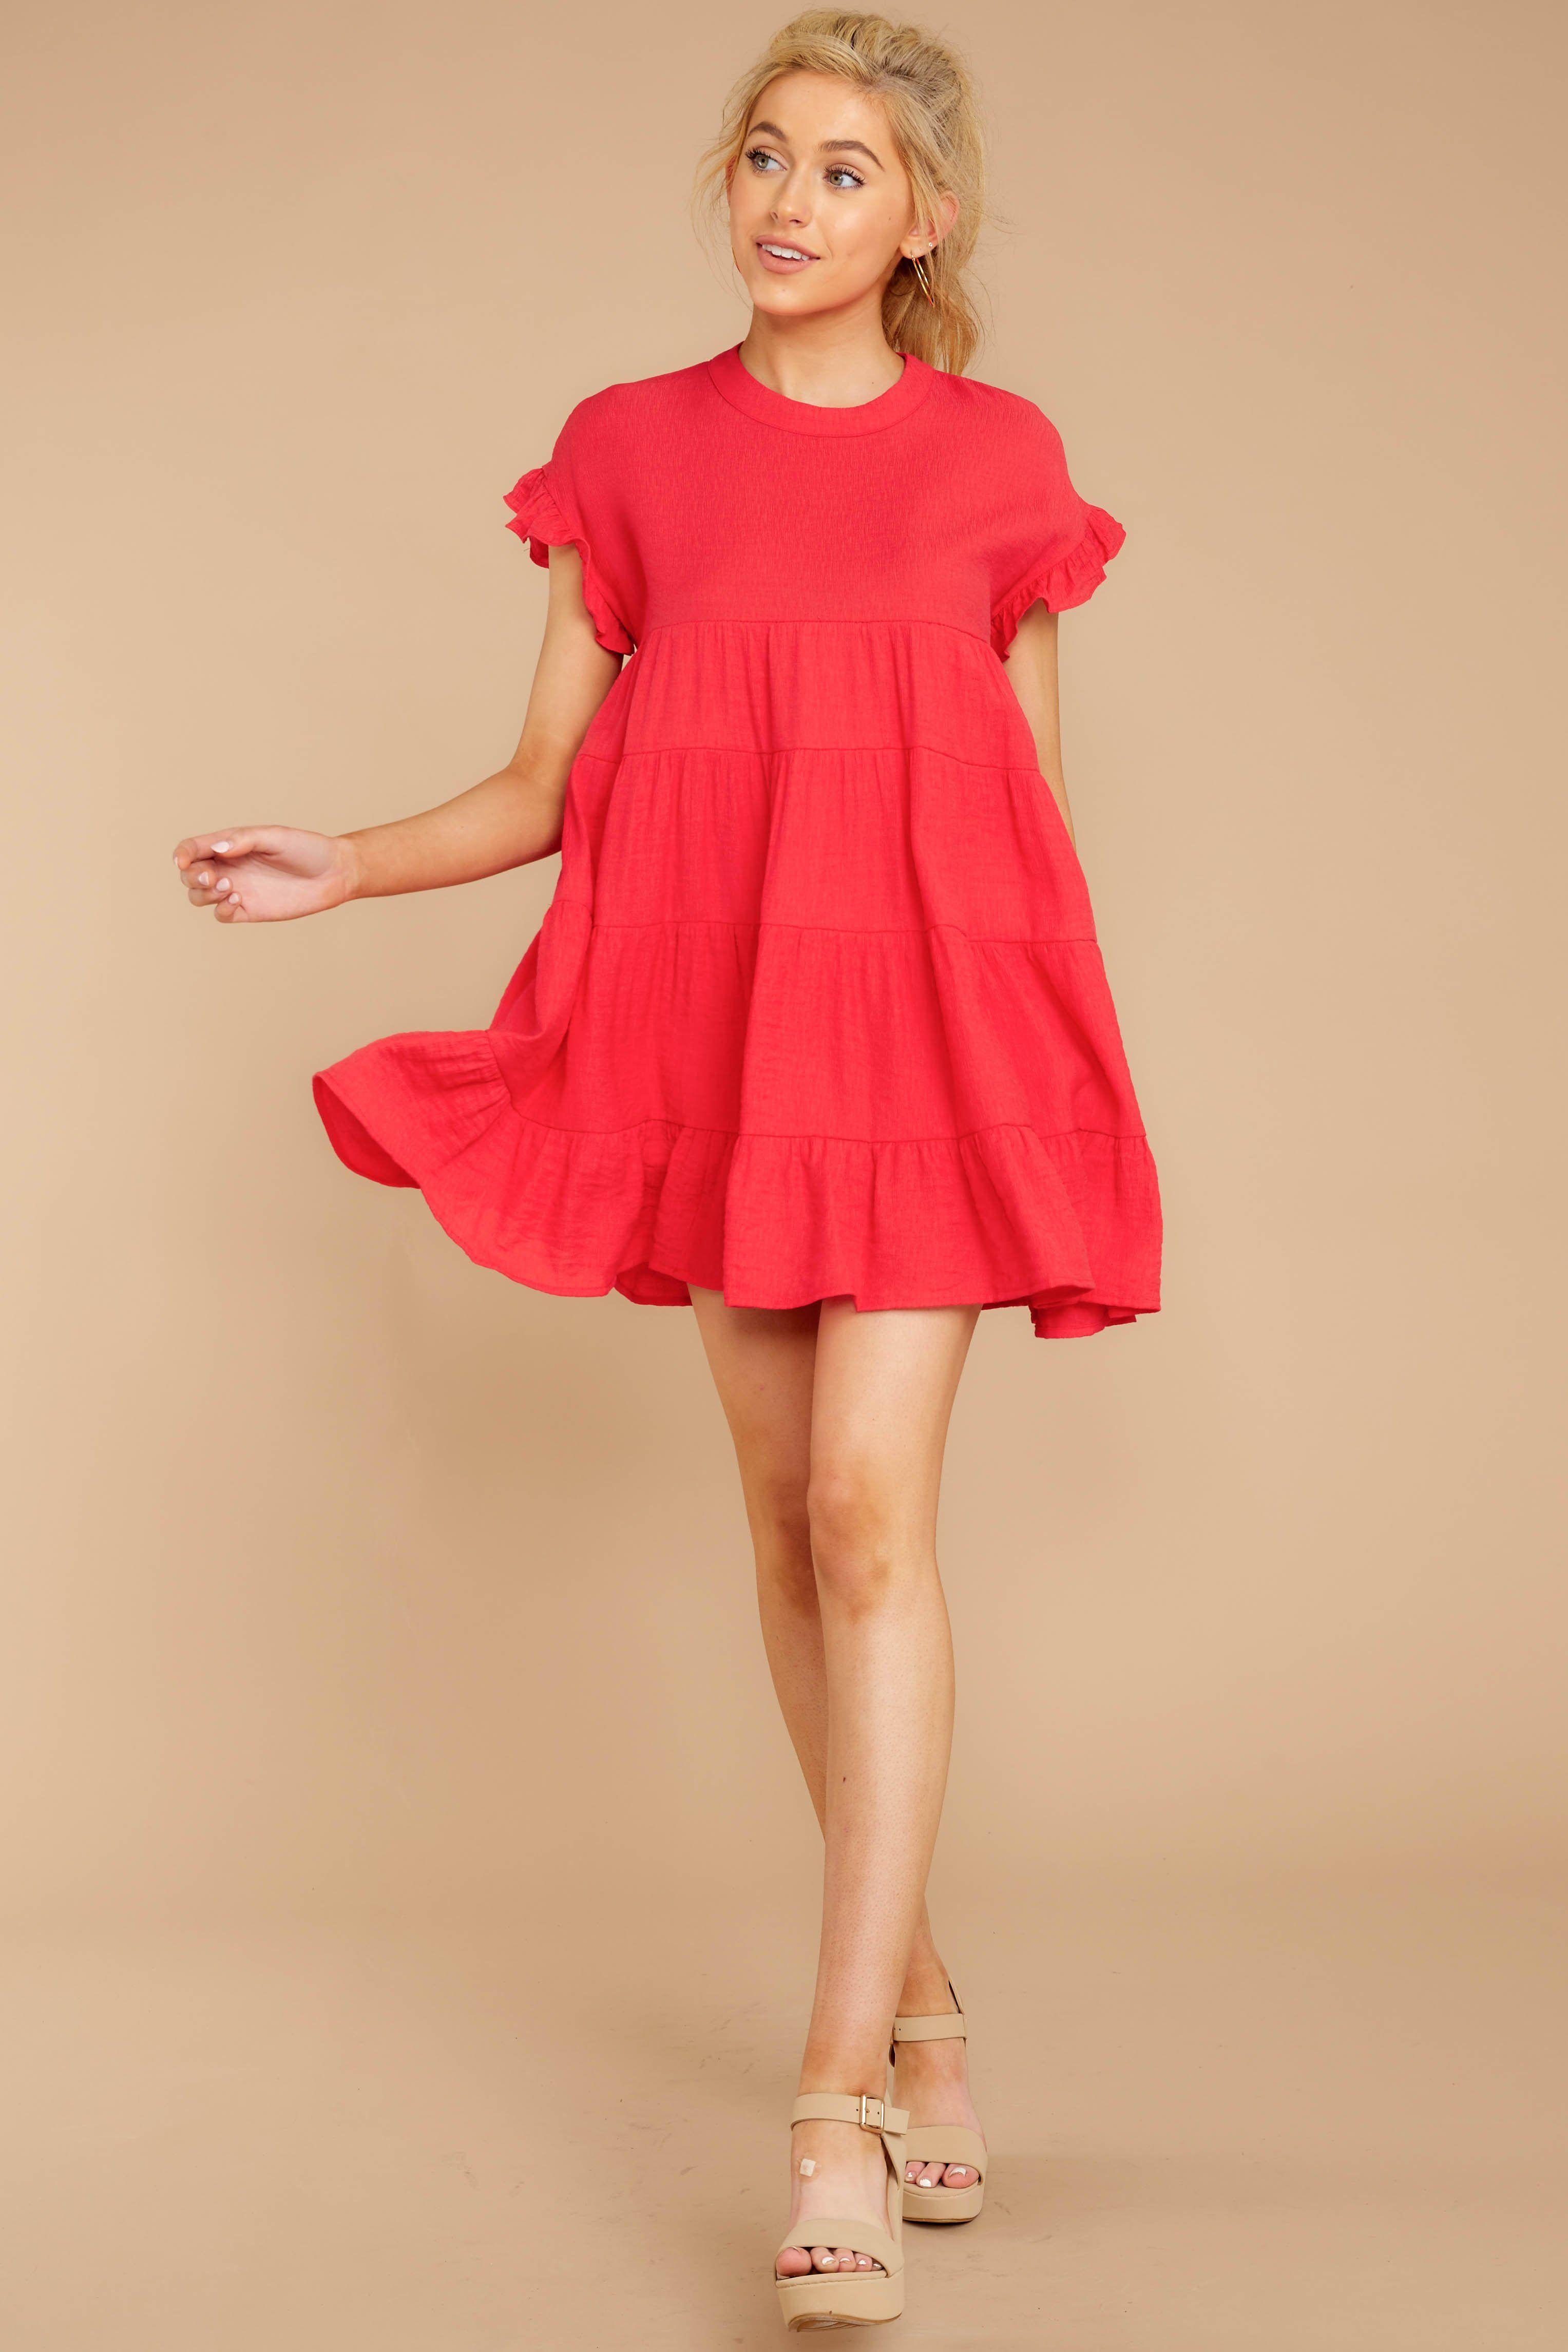 42++ Red babydoll dress info